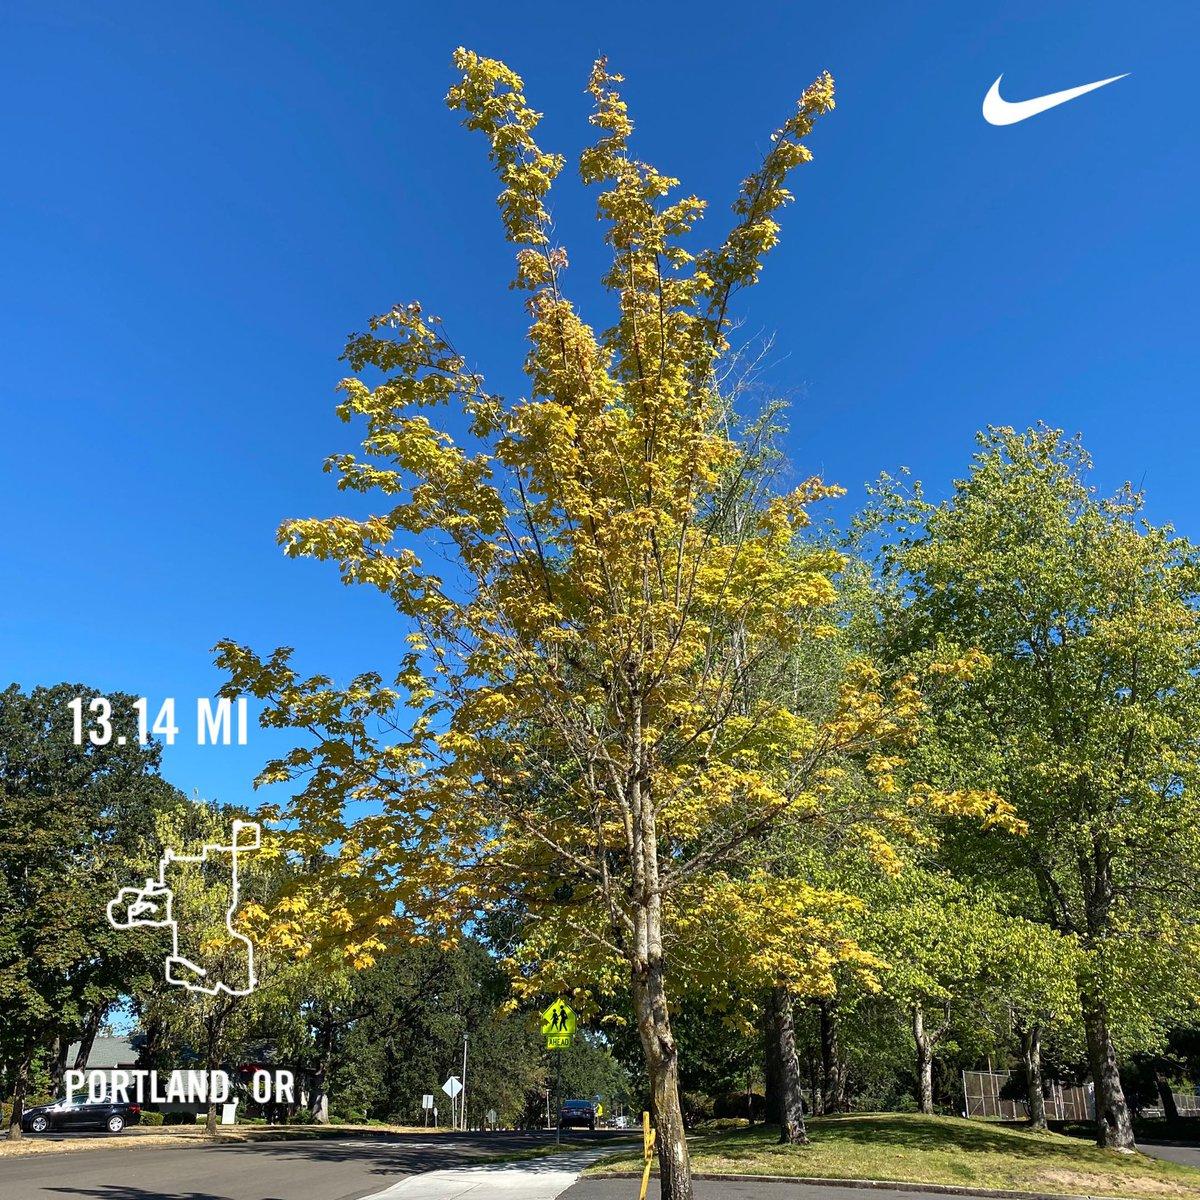 Another half marathon, Ran 13.14 miles with Nike Run Club #JustDoIt #nrc #nikerunning #nike #playfortheworld  #youcantstopus #socialdistancerunning https://t.co/p893WHBrwJ